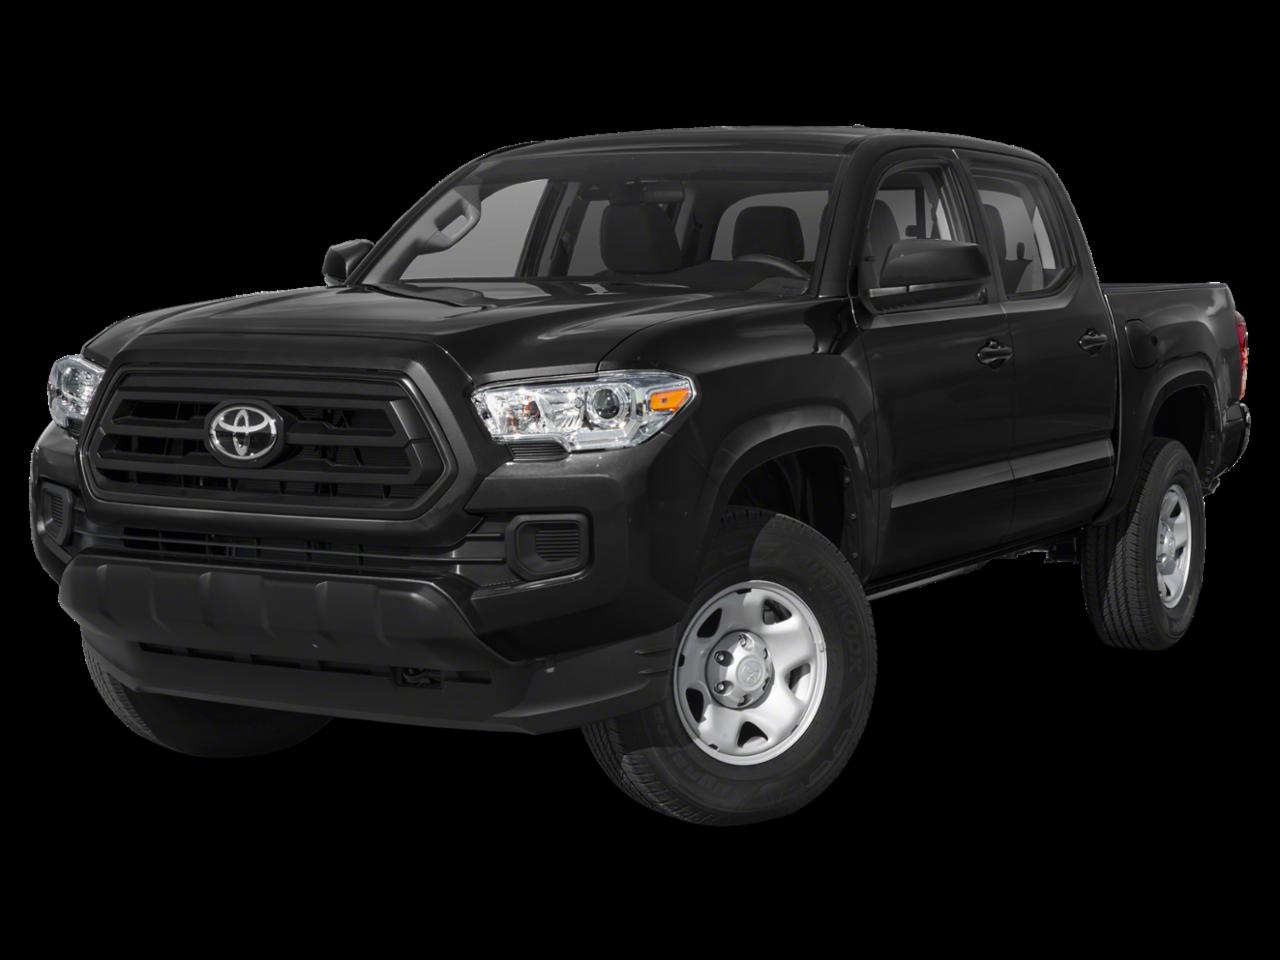 Toyota 2021 Tacoma 4WD TRD Pro